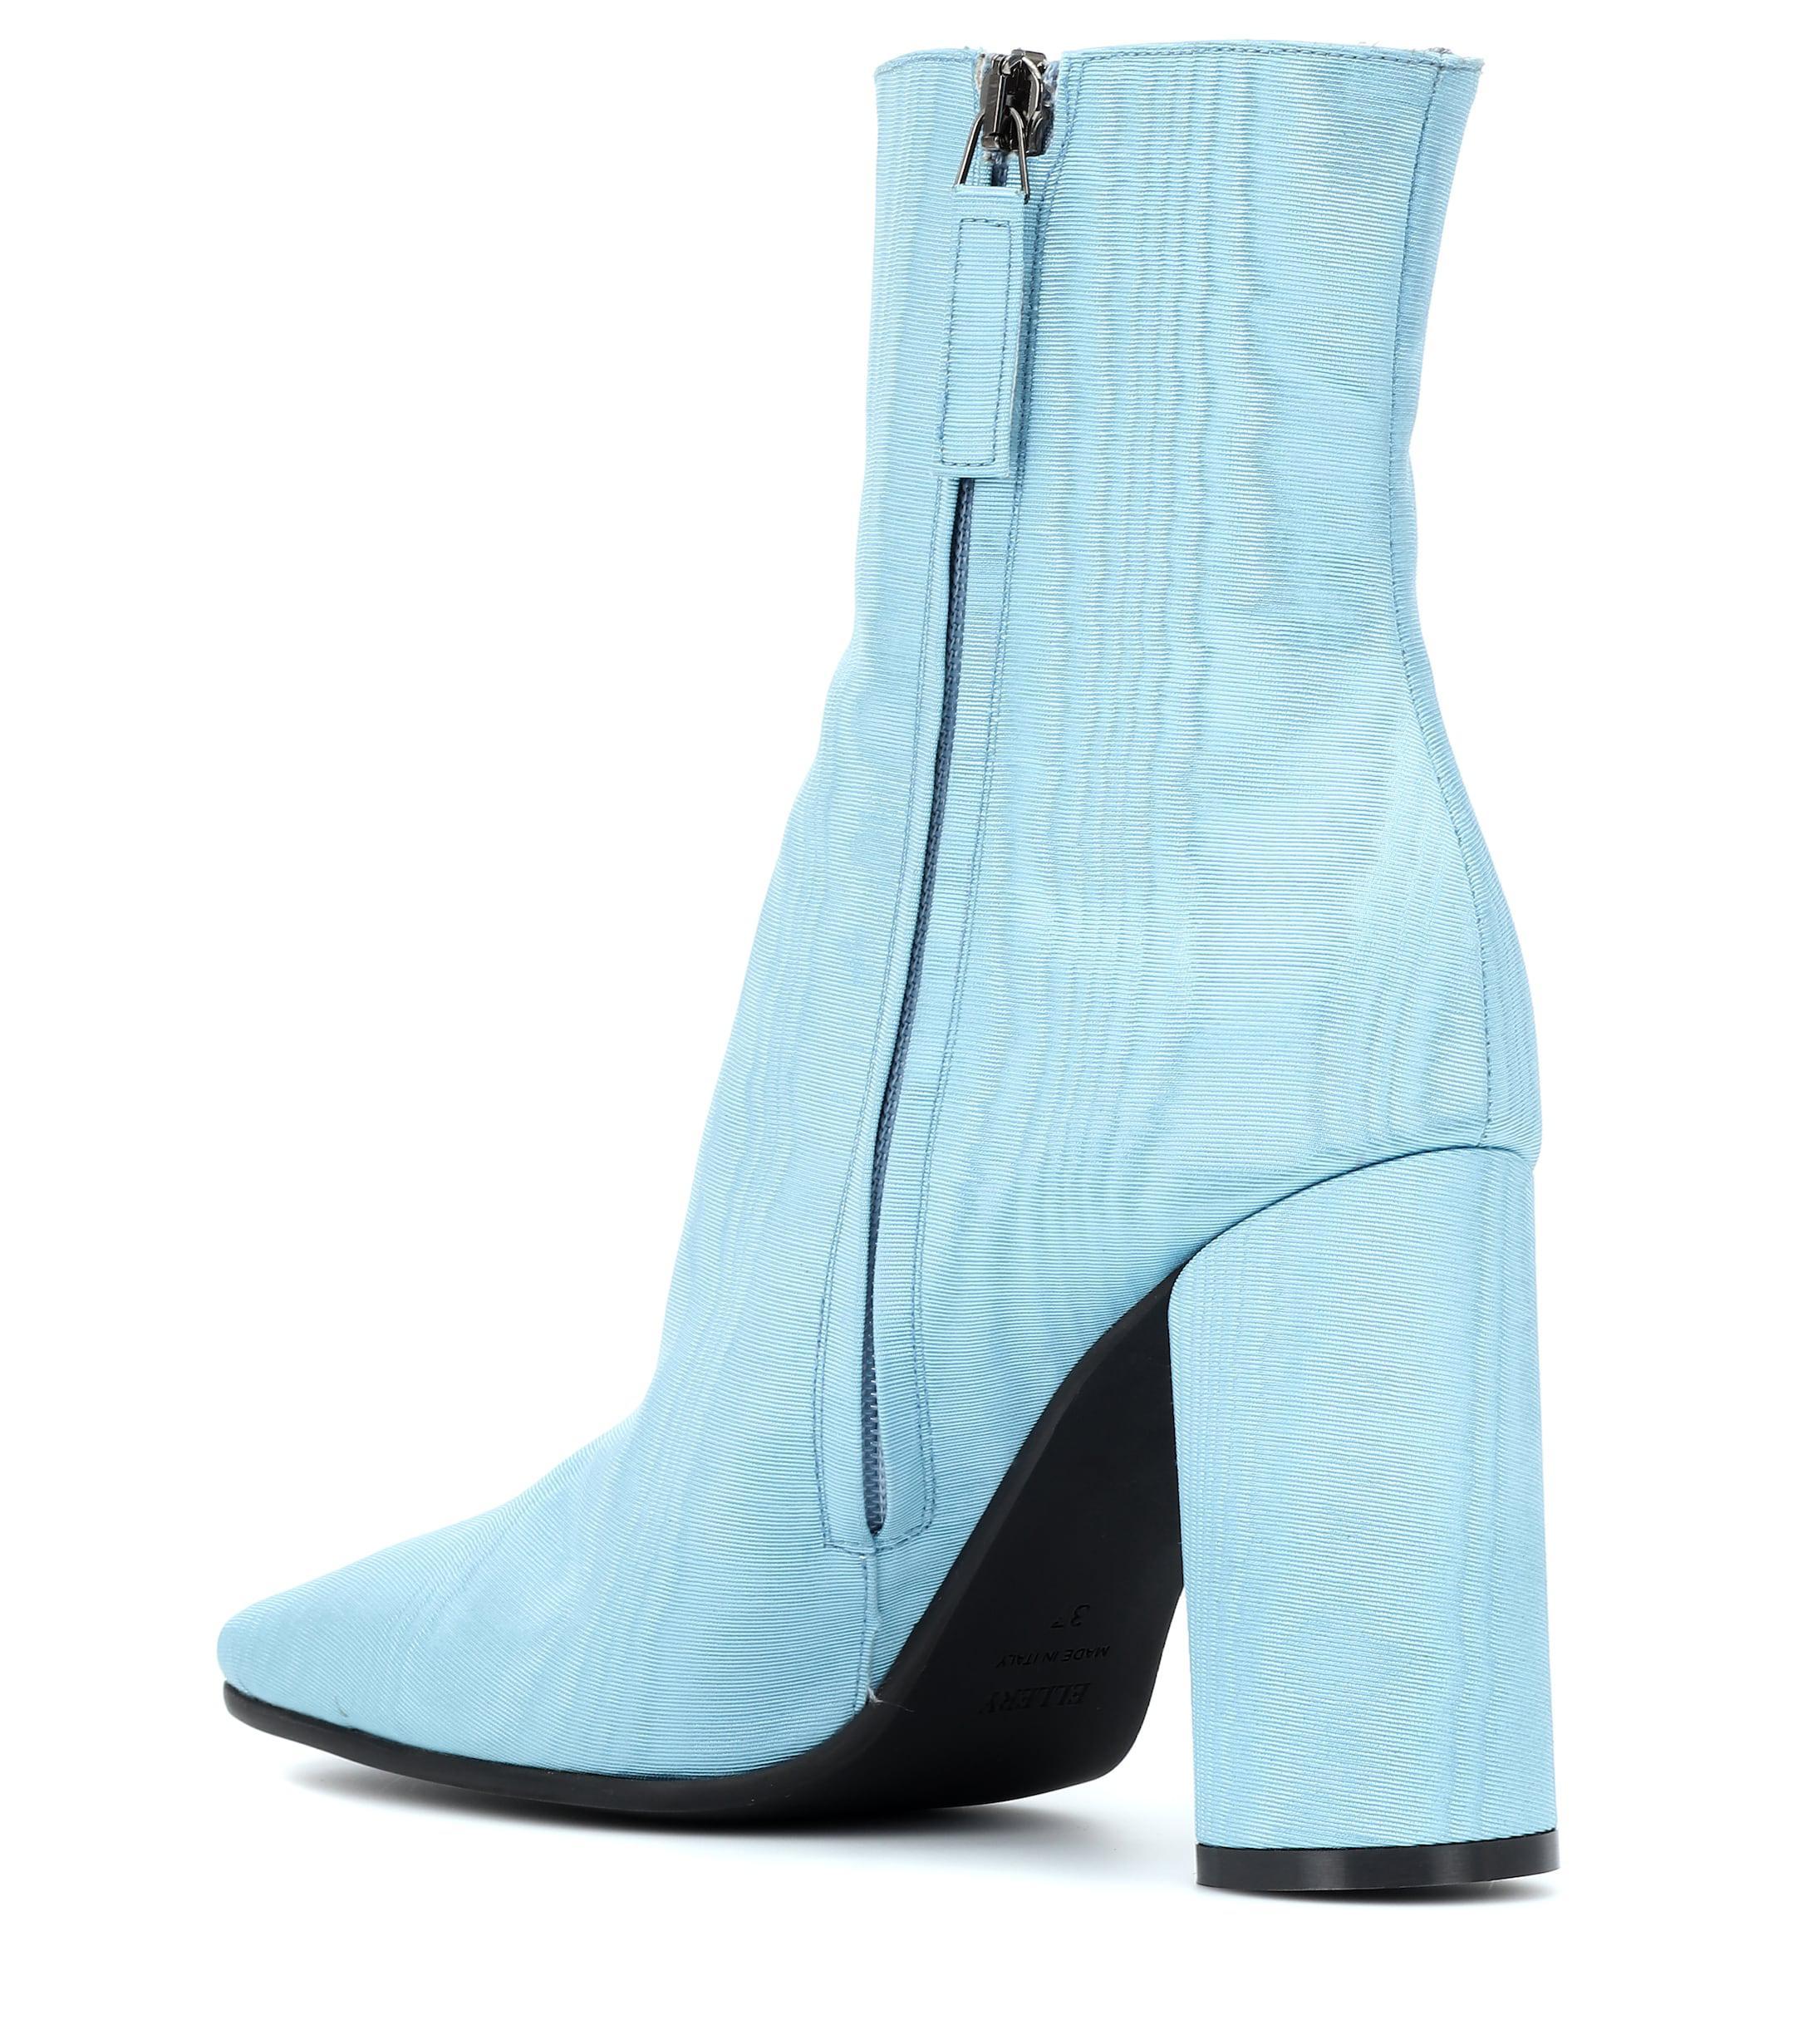 Botines de muaré Ellery de color Azul